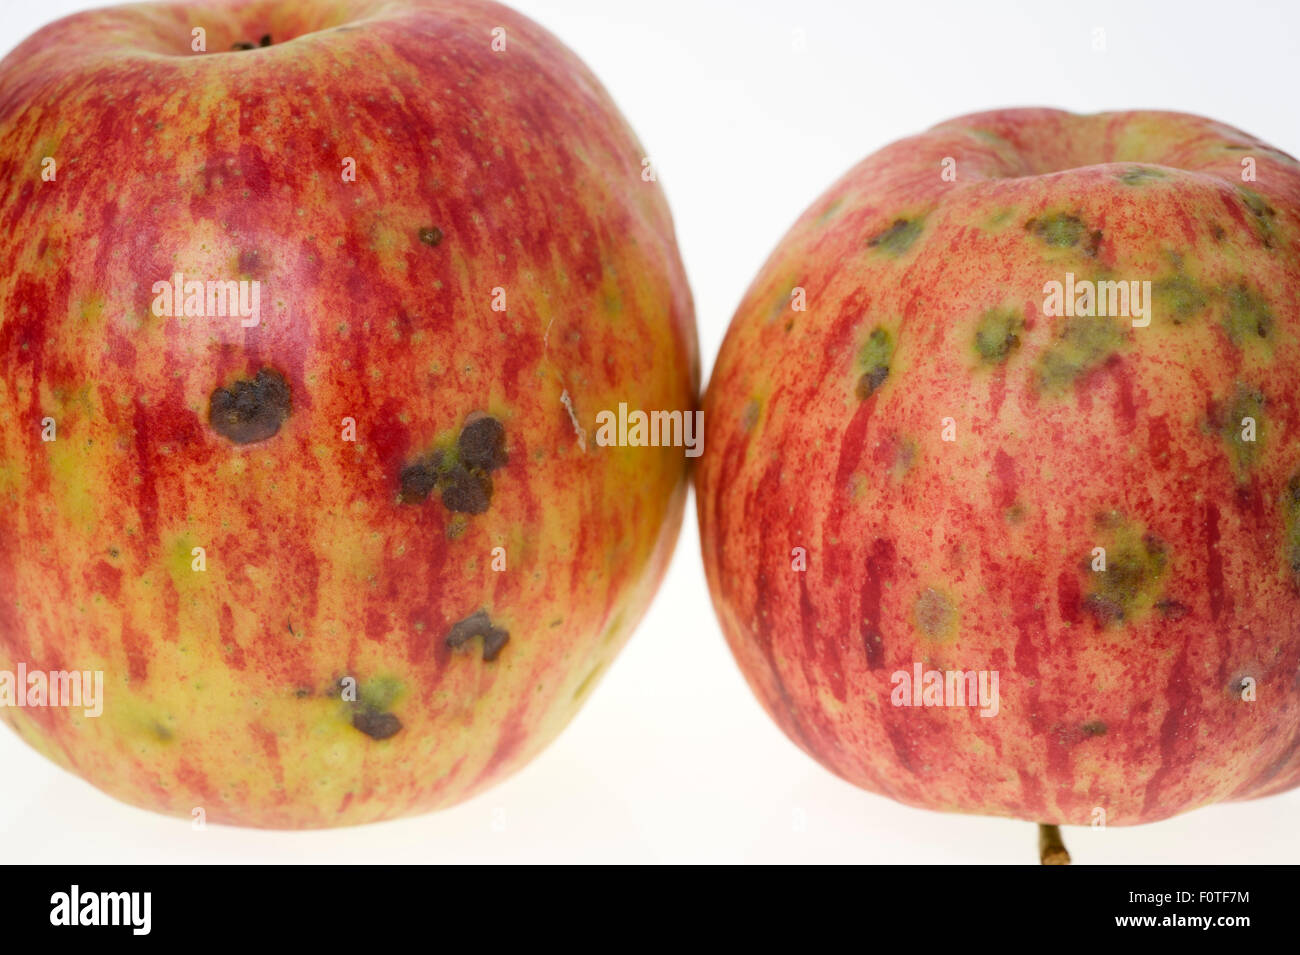 Bitter pit symptoms on apples - Stock Image